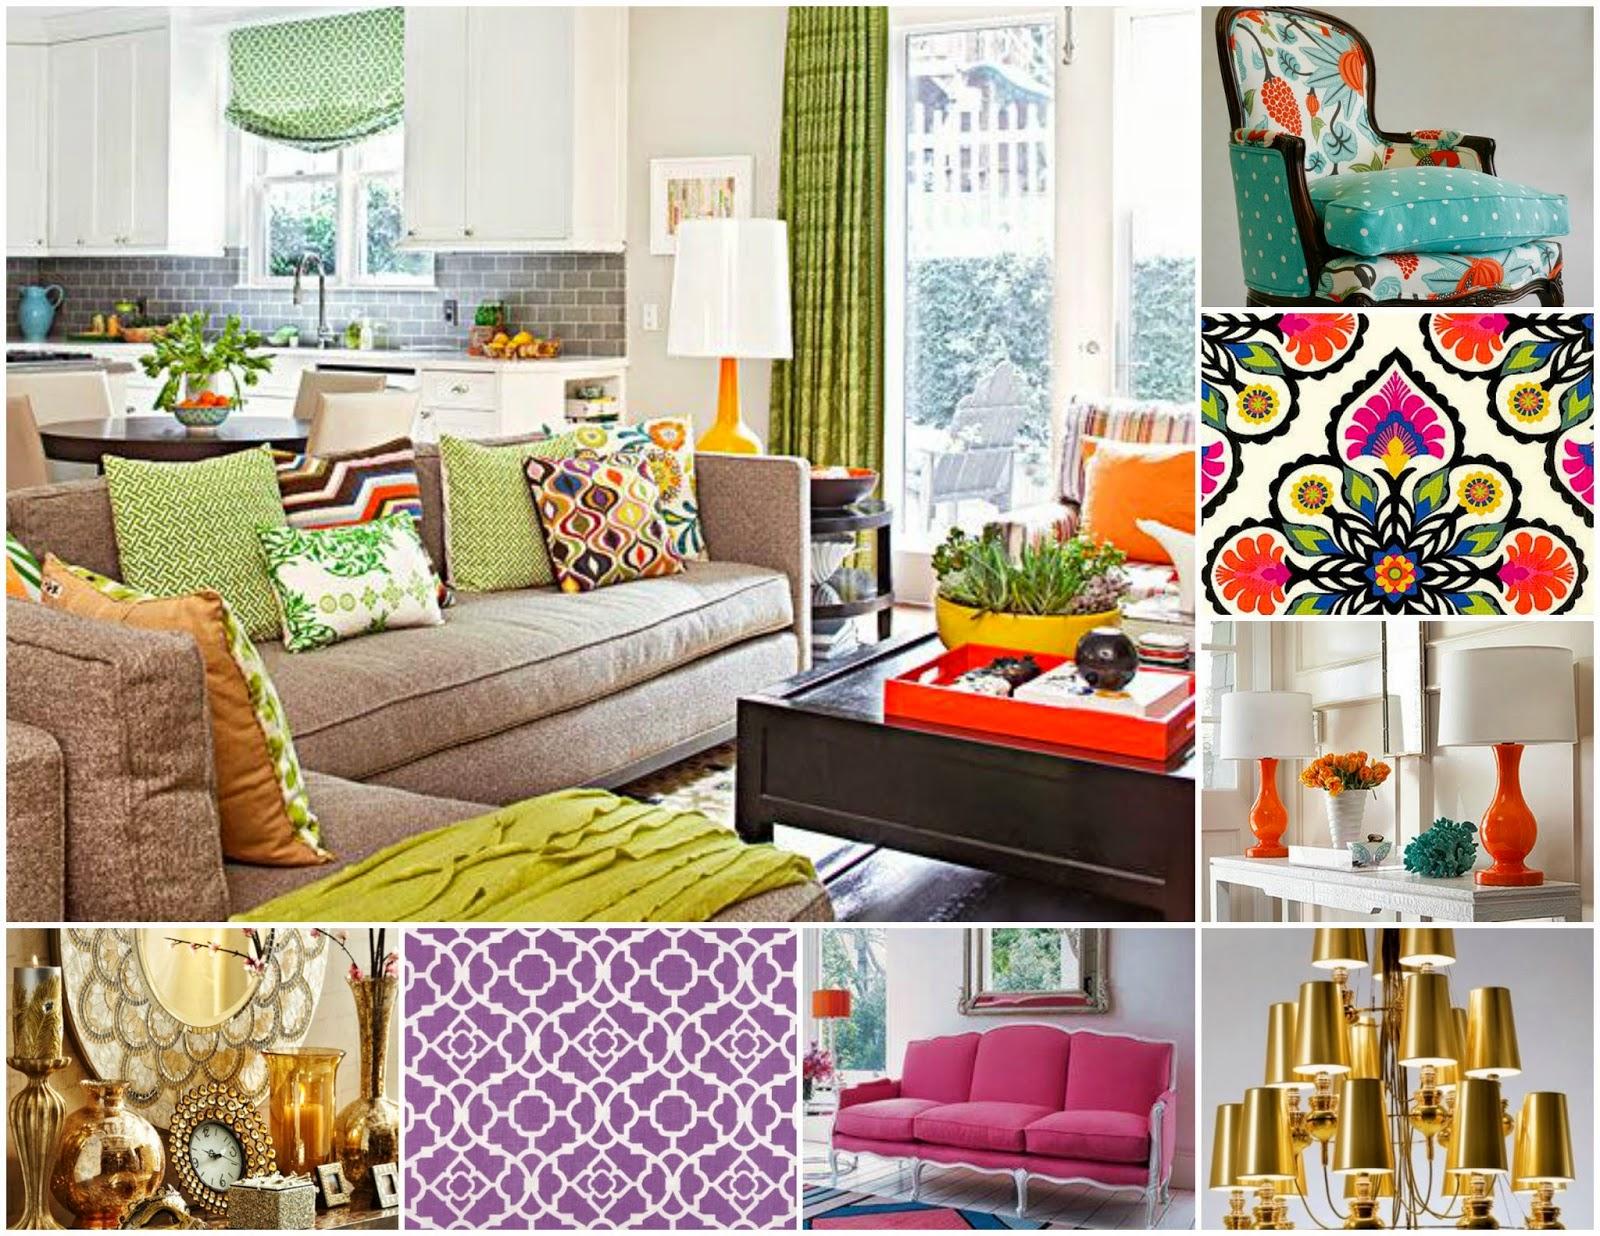 Inspiracion tendencias pantone interiores 2015 decorar for Tendencias decoracion interiores